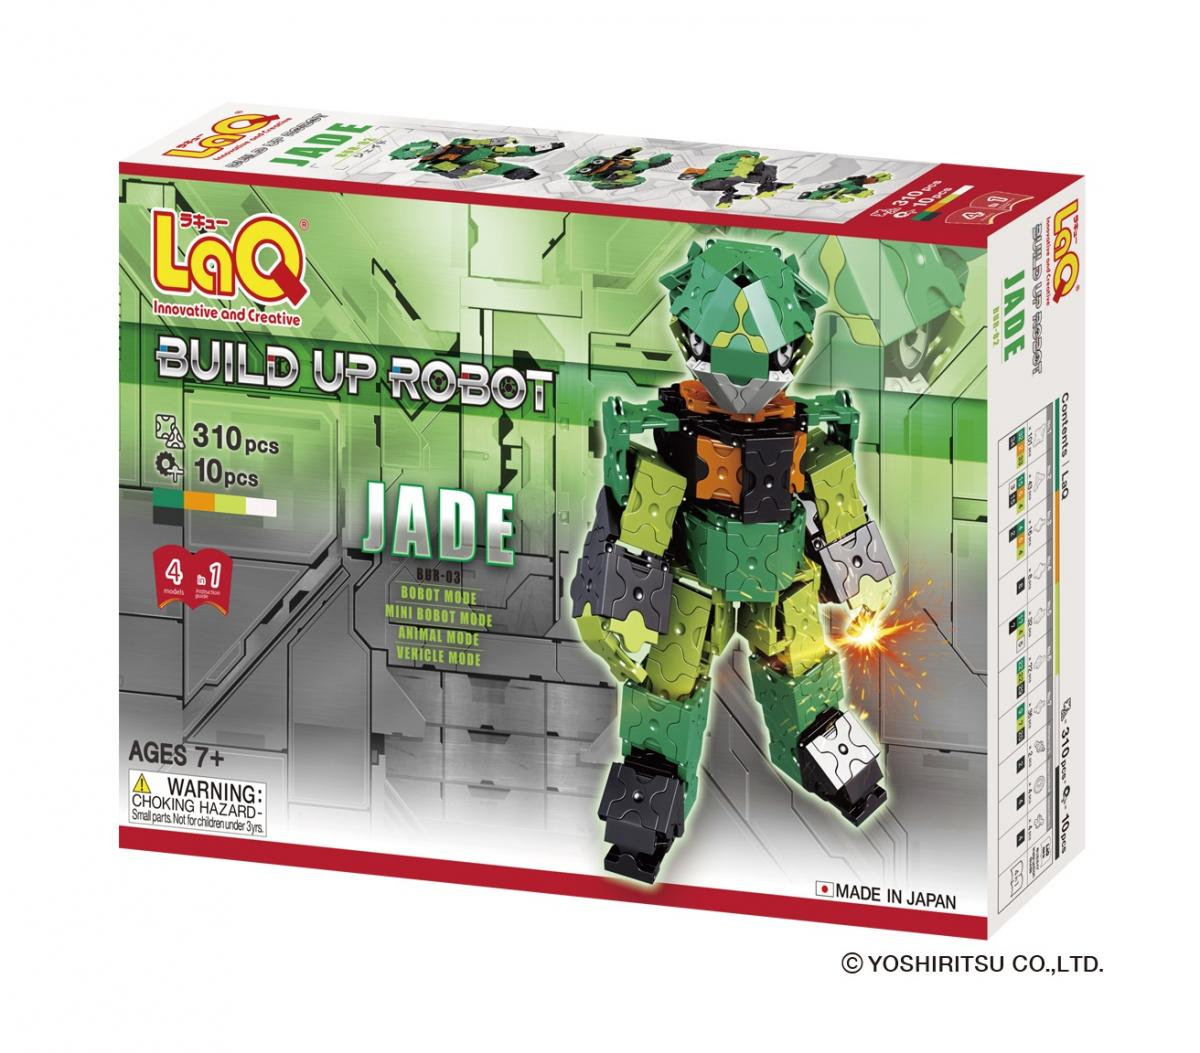 LaQ Build-up Robot Jade